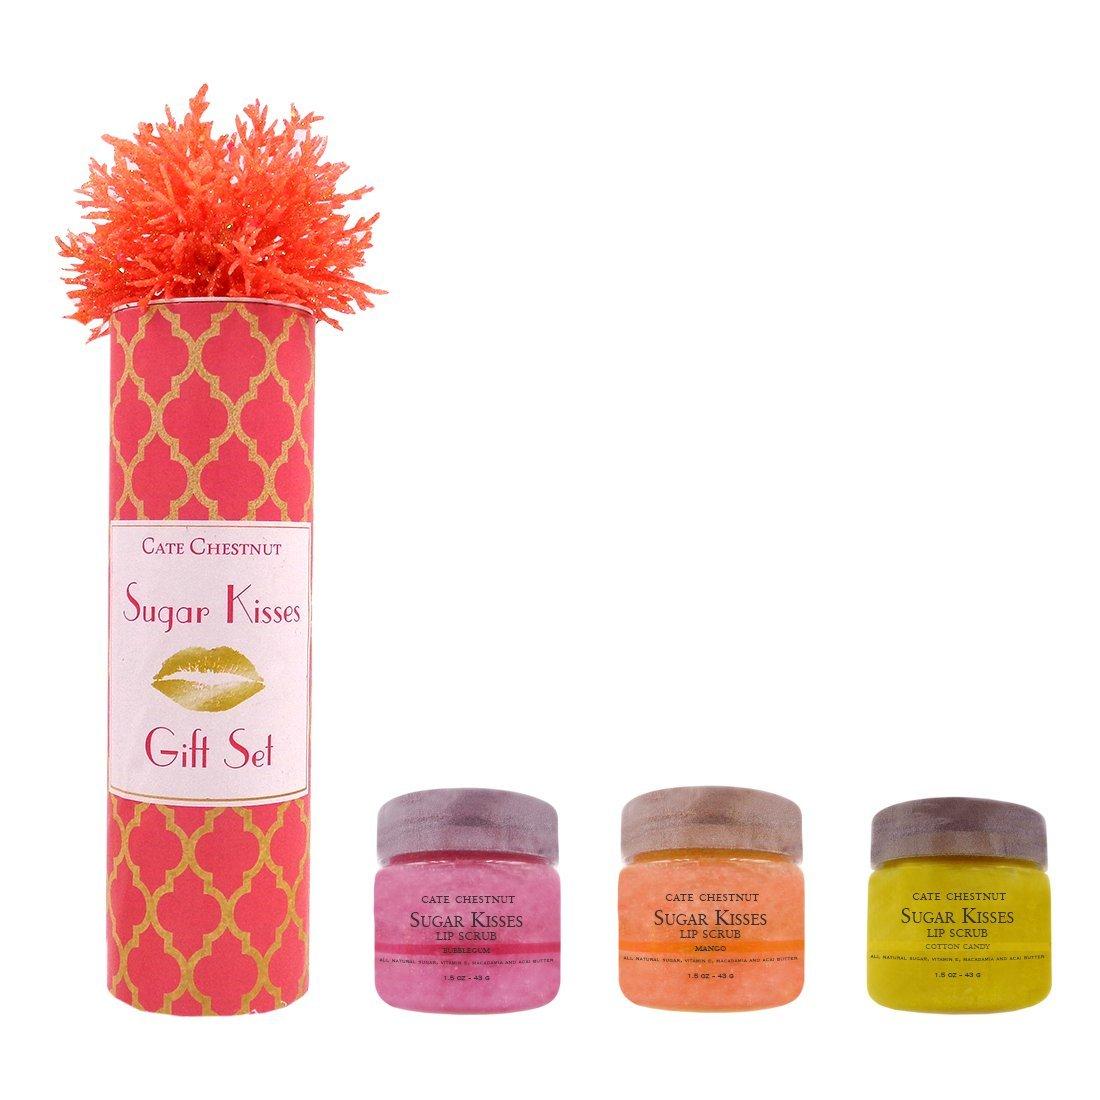 Sugar Kisses Lip Scrub Gift Set 3 Flavors (Bubblegum, Mango, Cotton Candy)